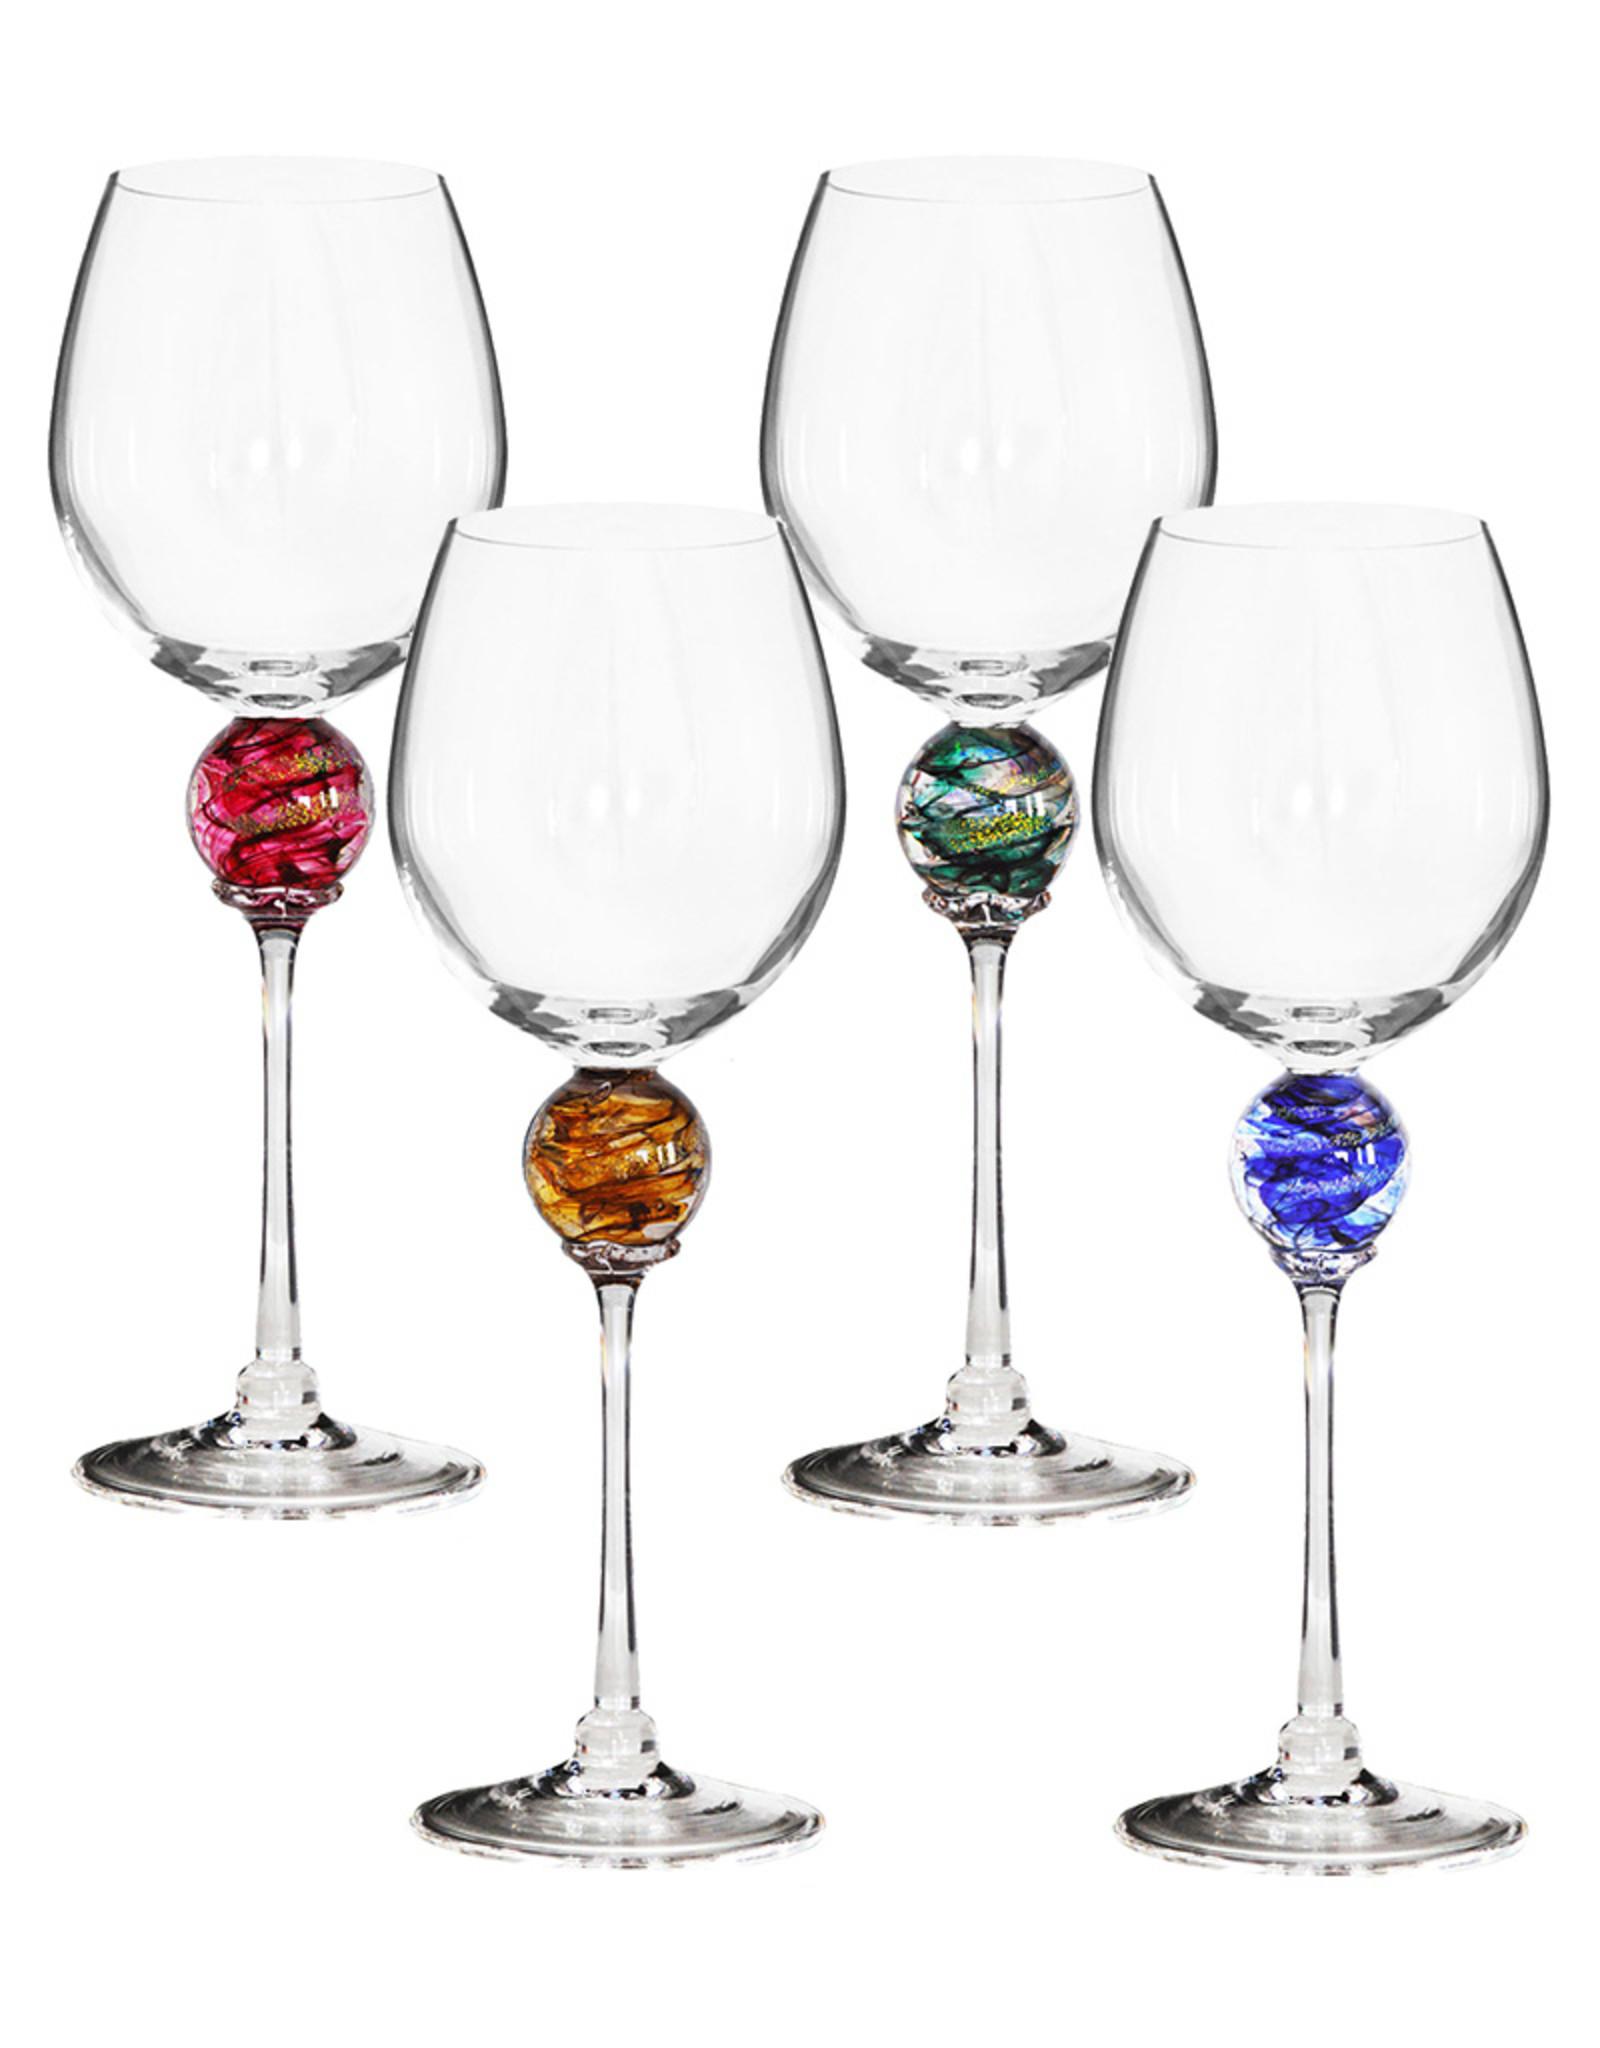 ROMEO GLASS AMETHYST PLANET WINE GLASS